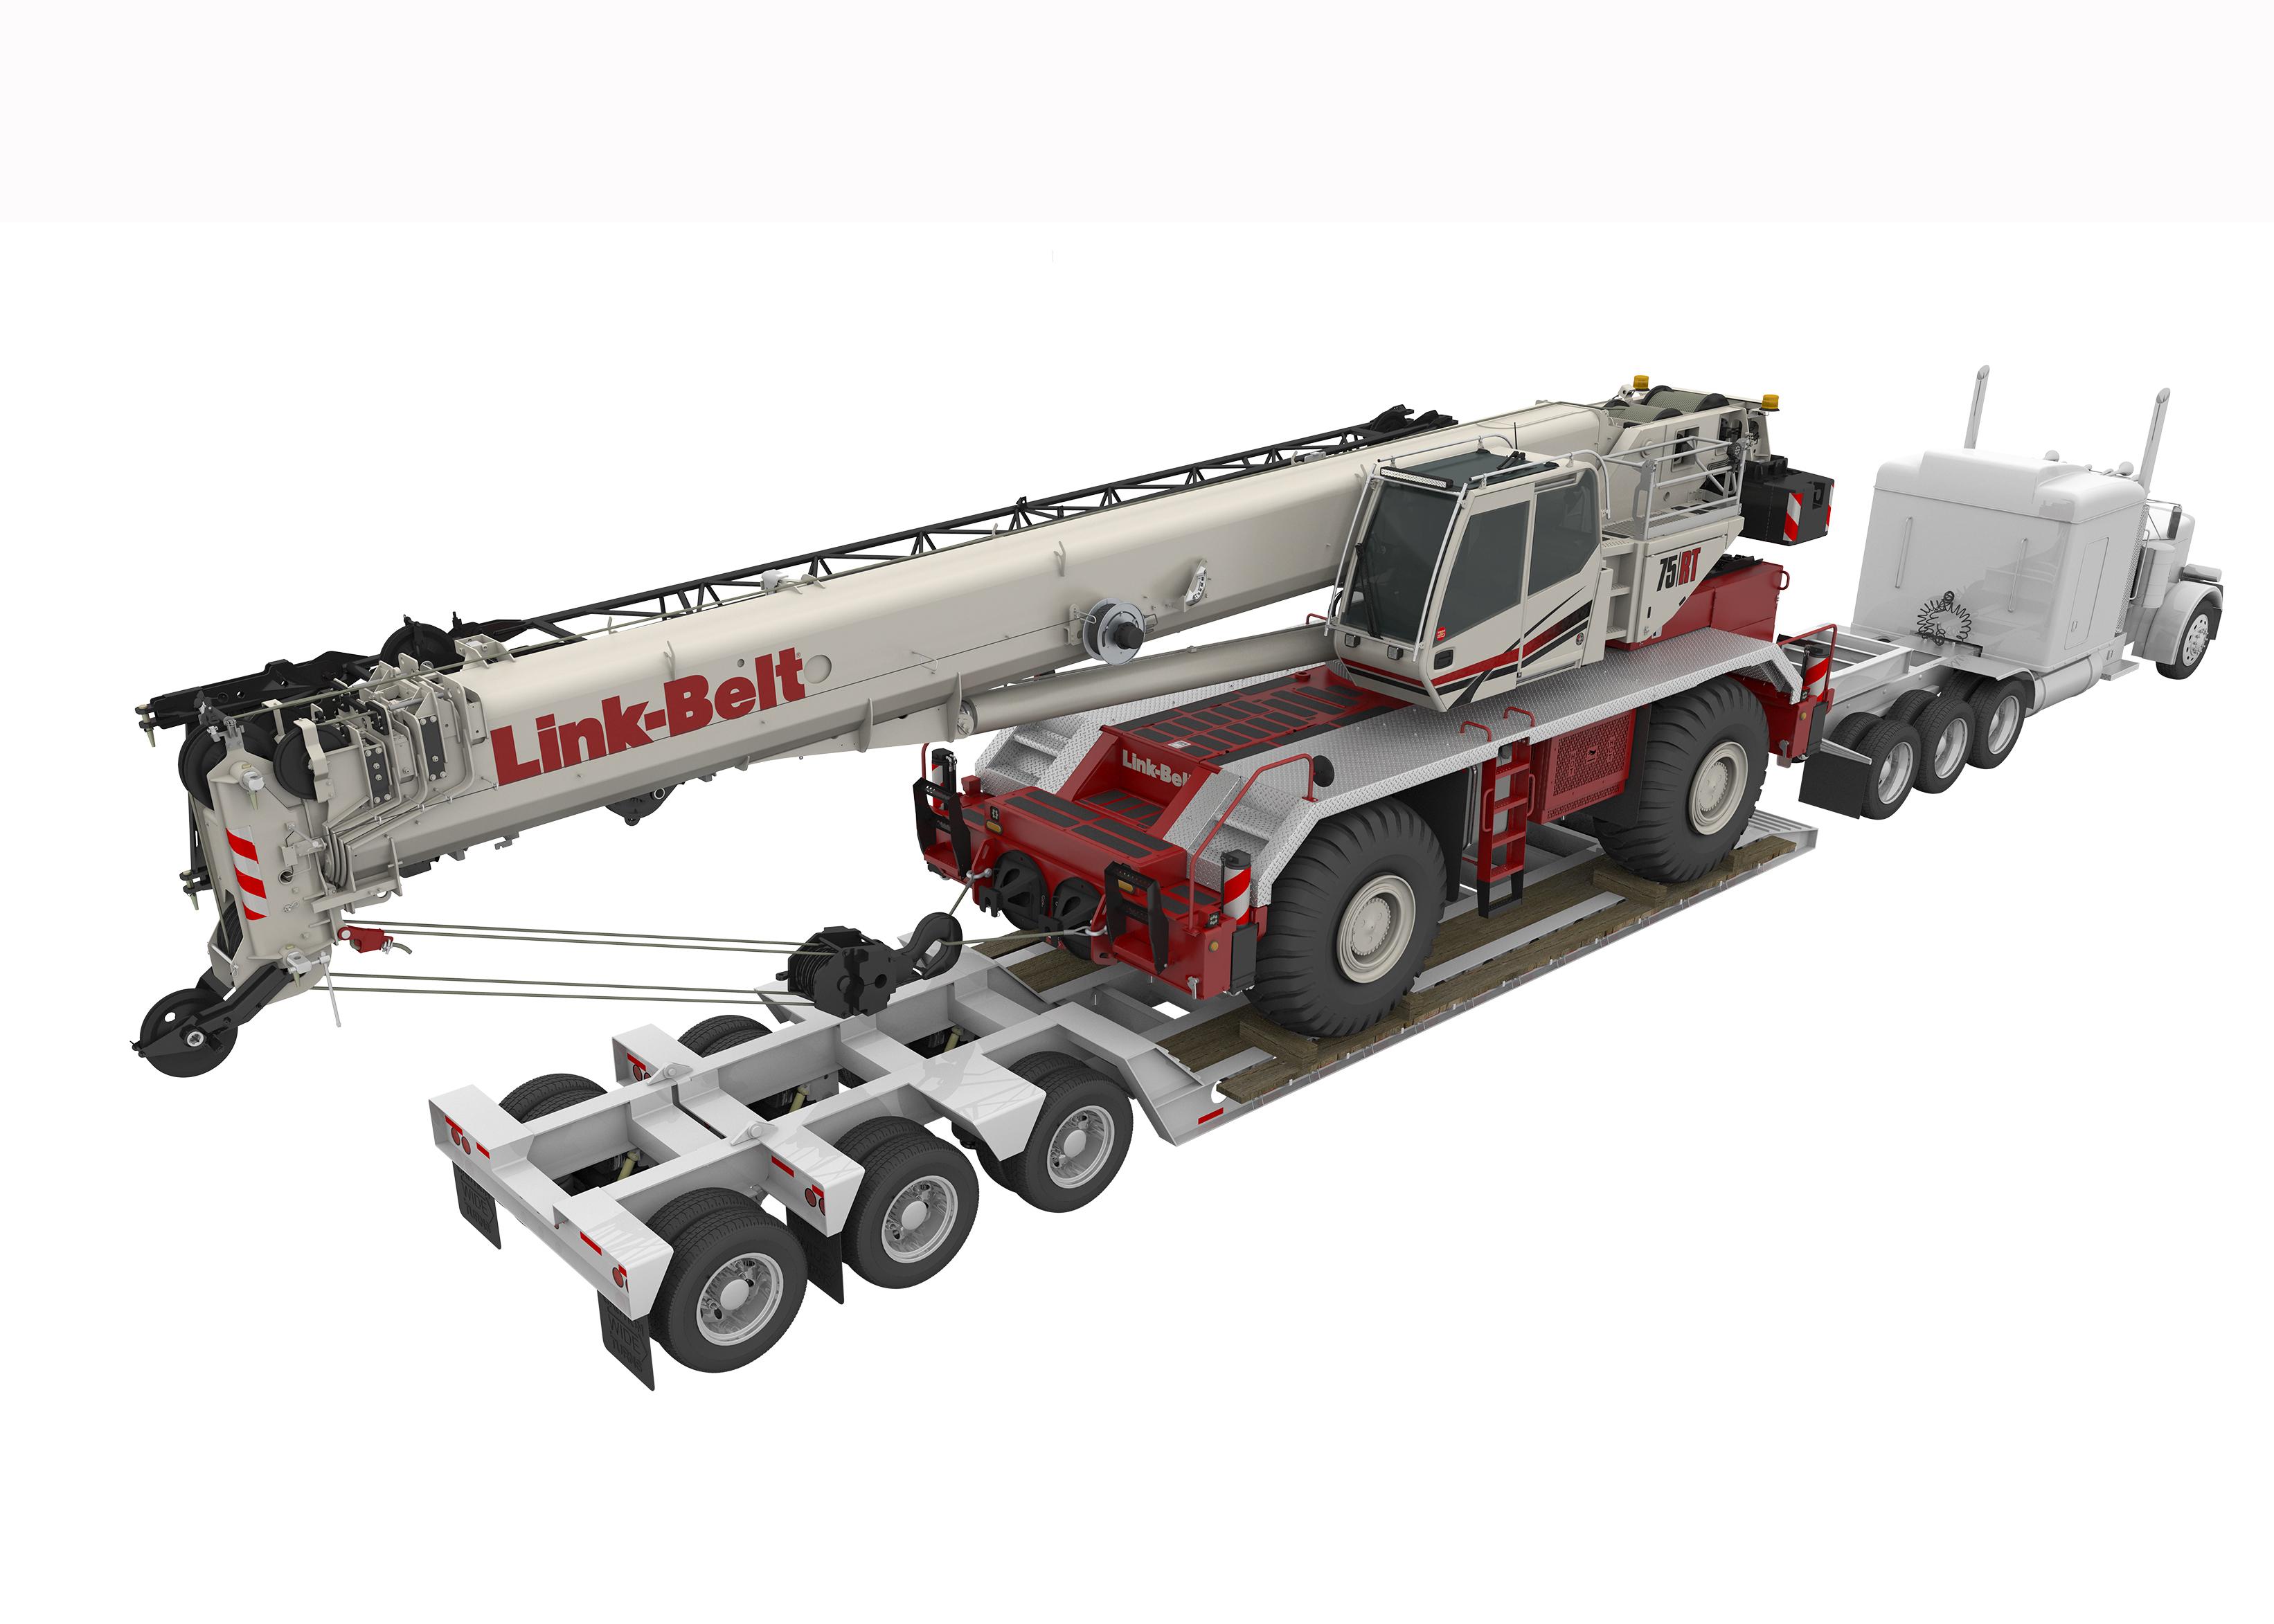 Featured Crane Link Belt 75rt Rough Terrain Network News Kenworth T370 Fuse Box Transport